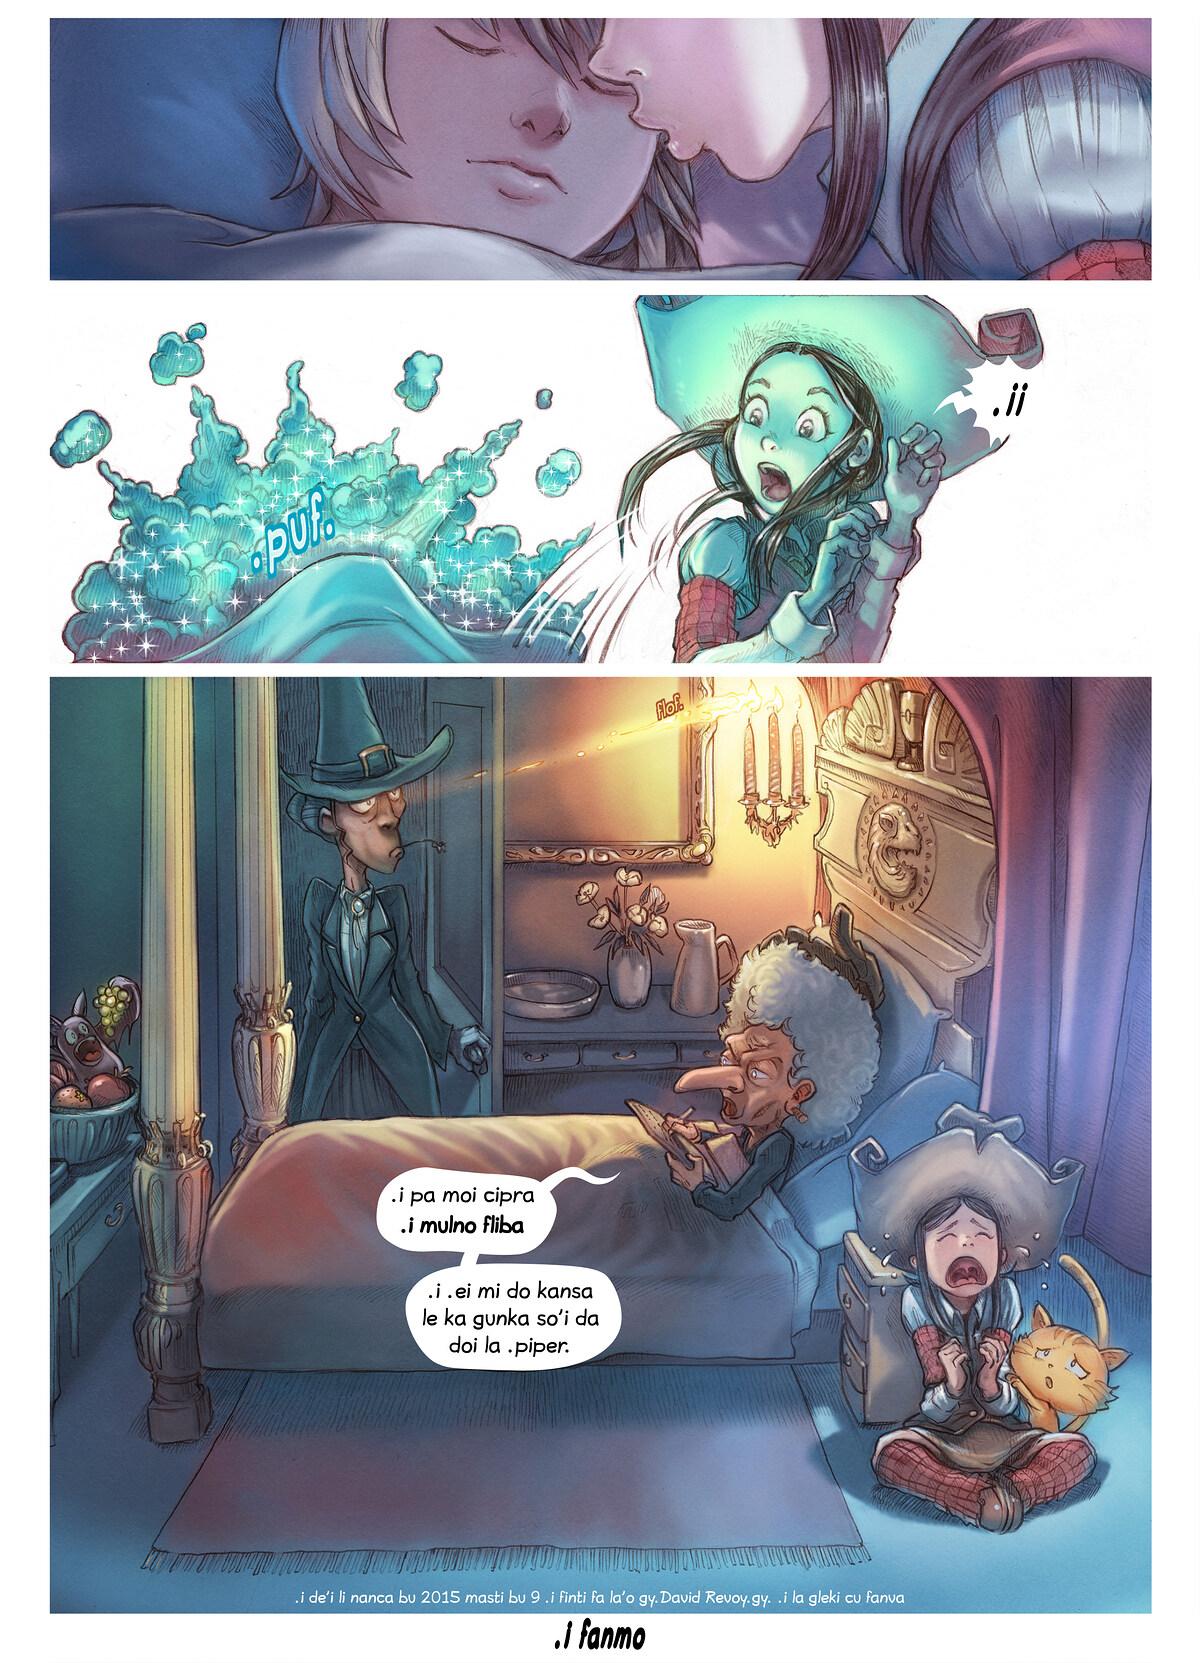 i 11 mo'o lisri le te makfa pe la kalsa, Page 6